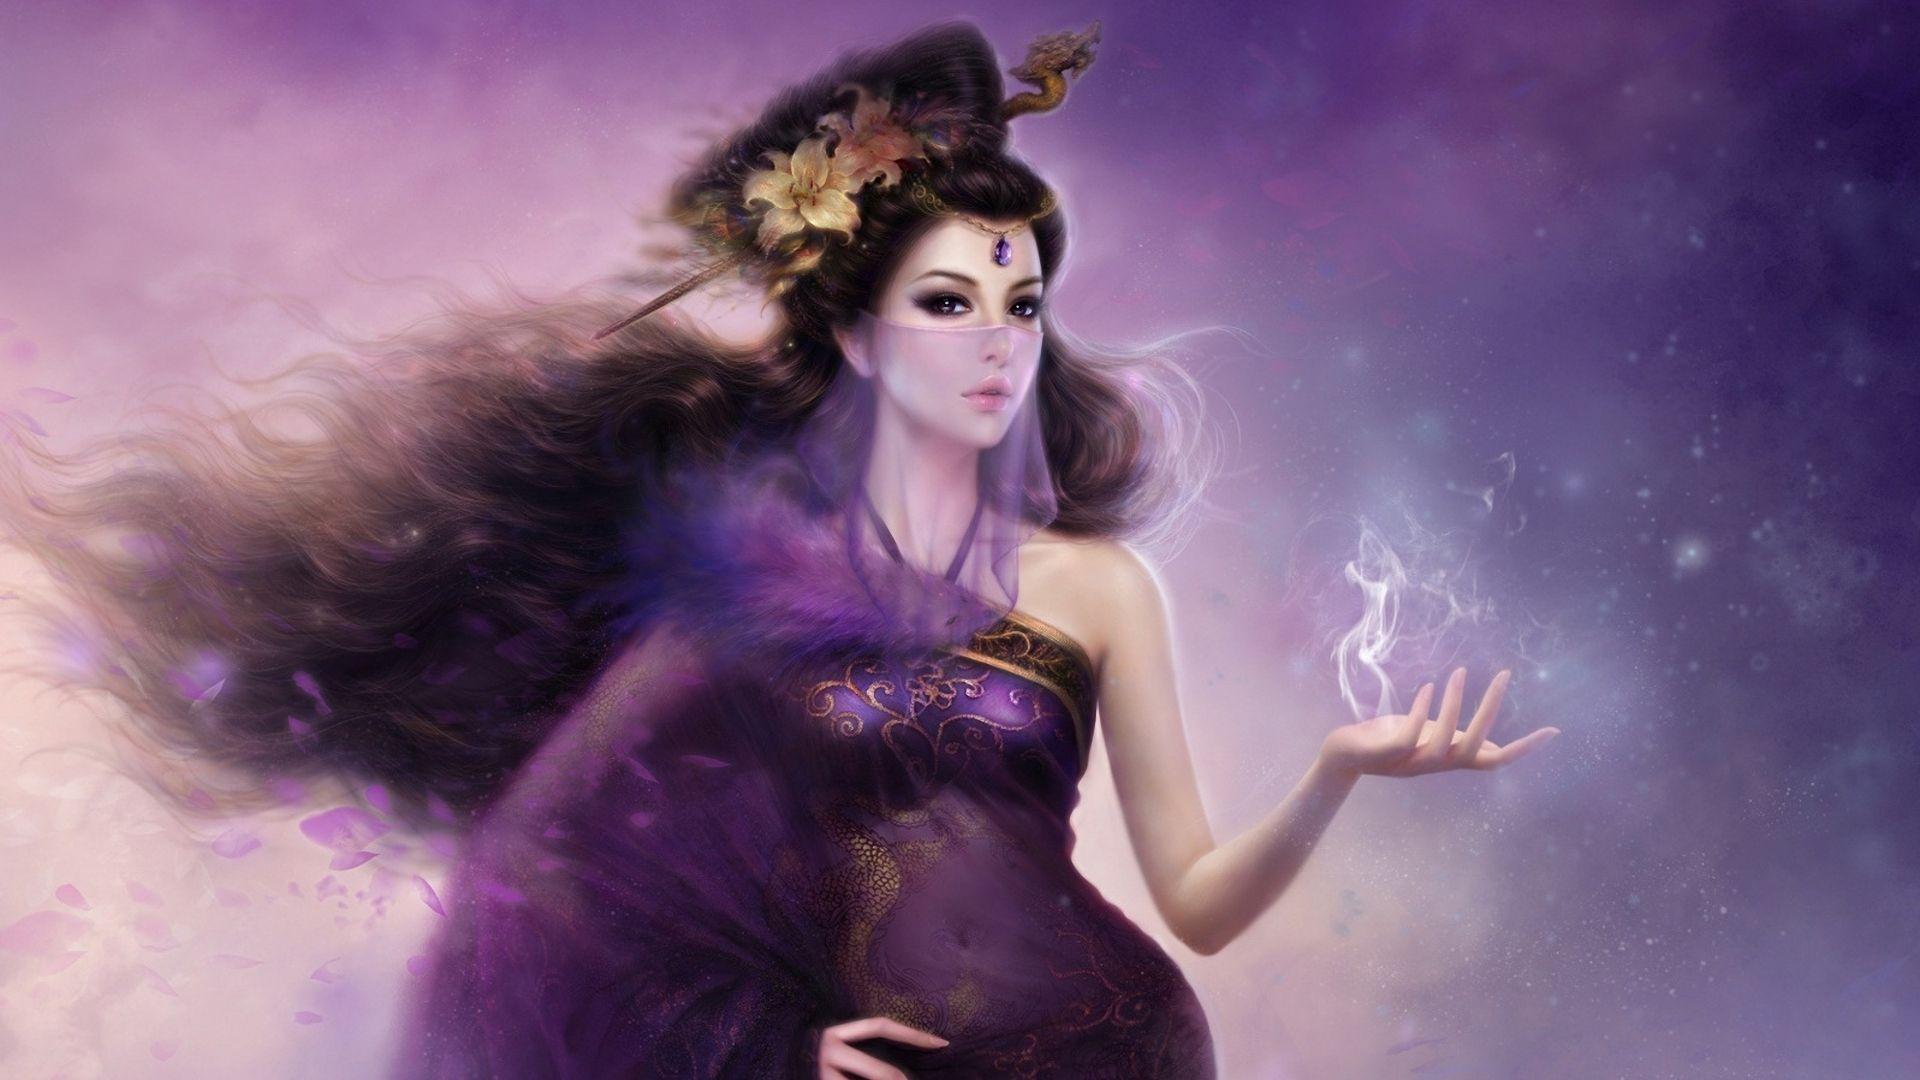 fantasy beautiful | beautiful fantasy girl - wallpaper, high